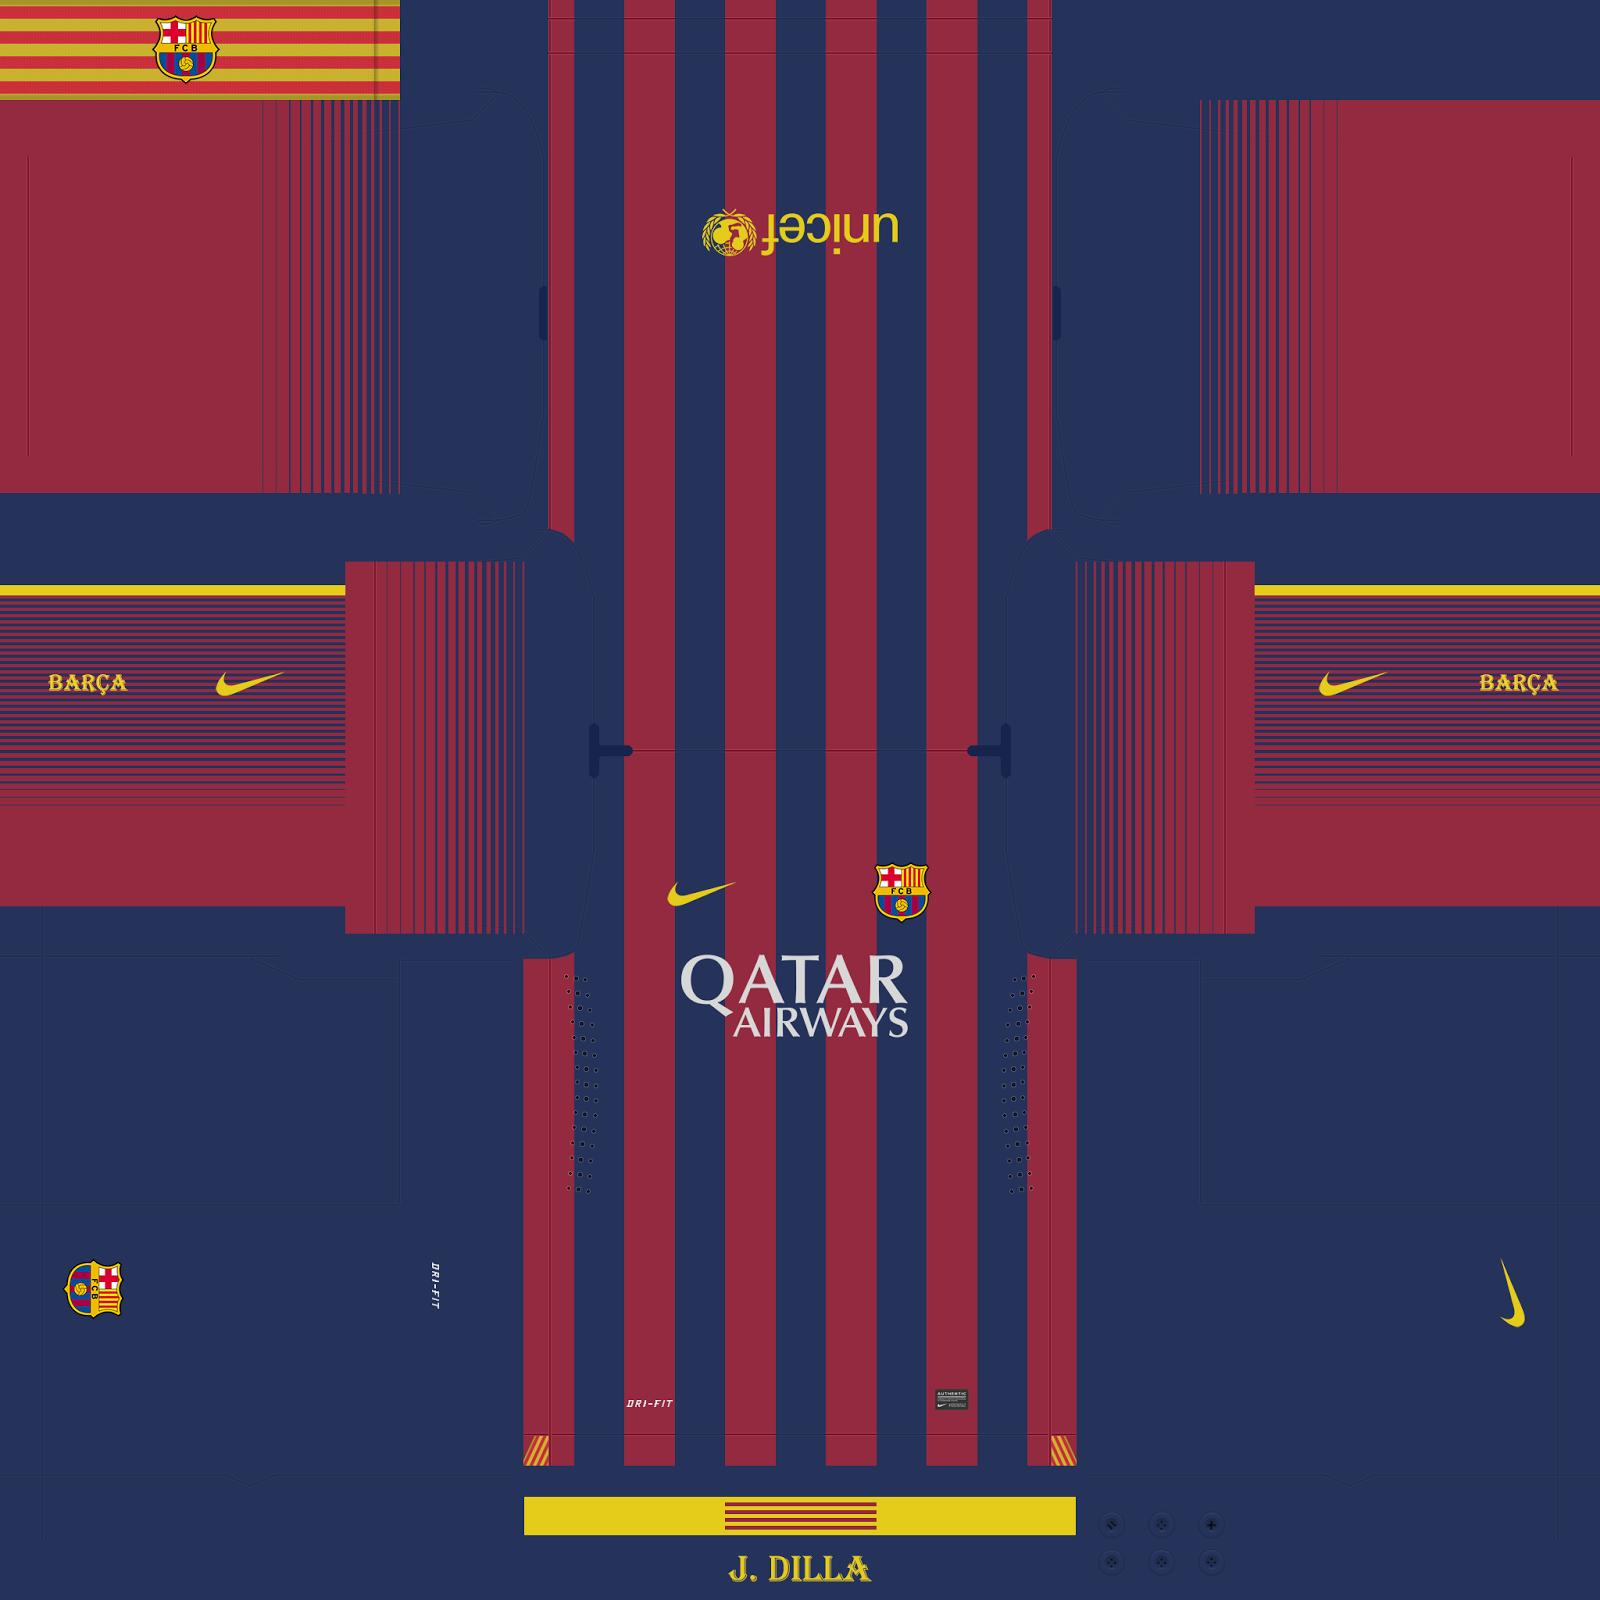 Fc Barcelona Kit 512 Times 512 | tokovenuz.com